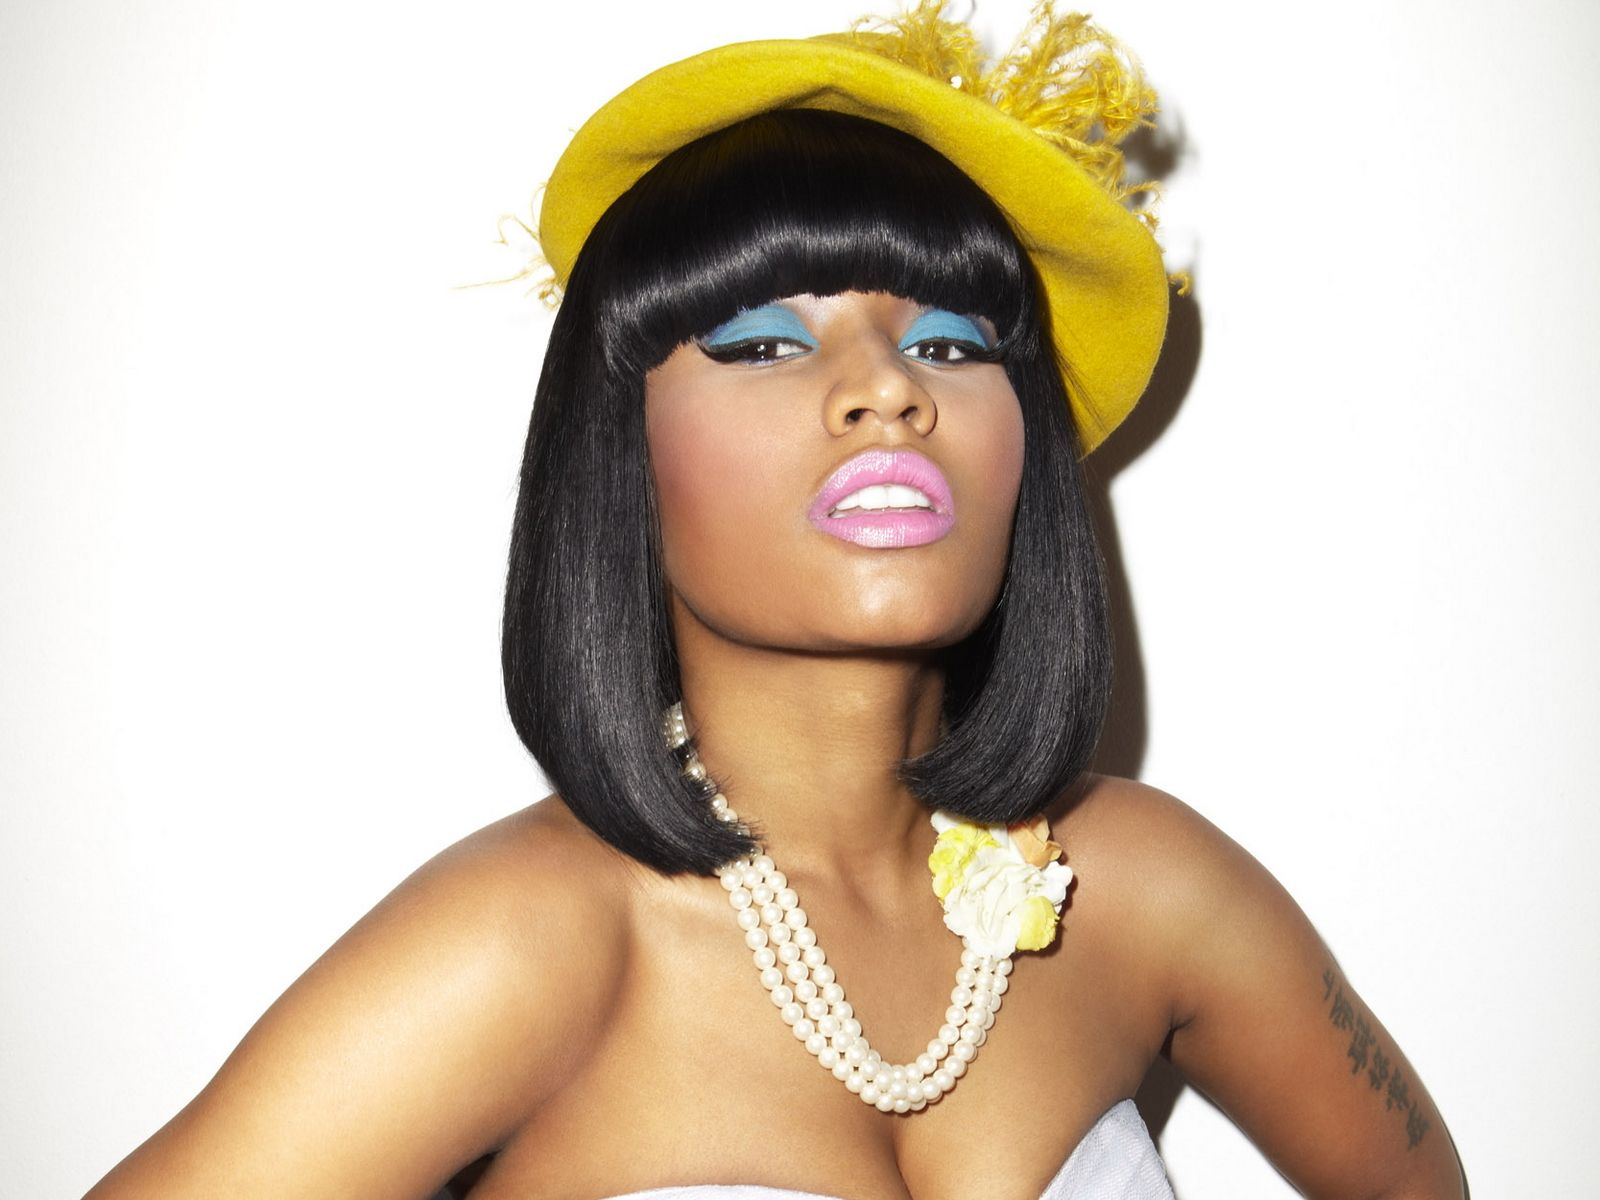 Nicki Minaj Celebrity Wigs Nicki Minaj Wallpaper Nicki Minaj